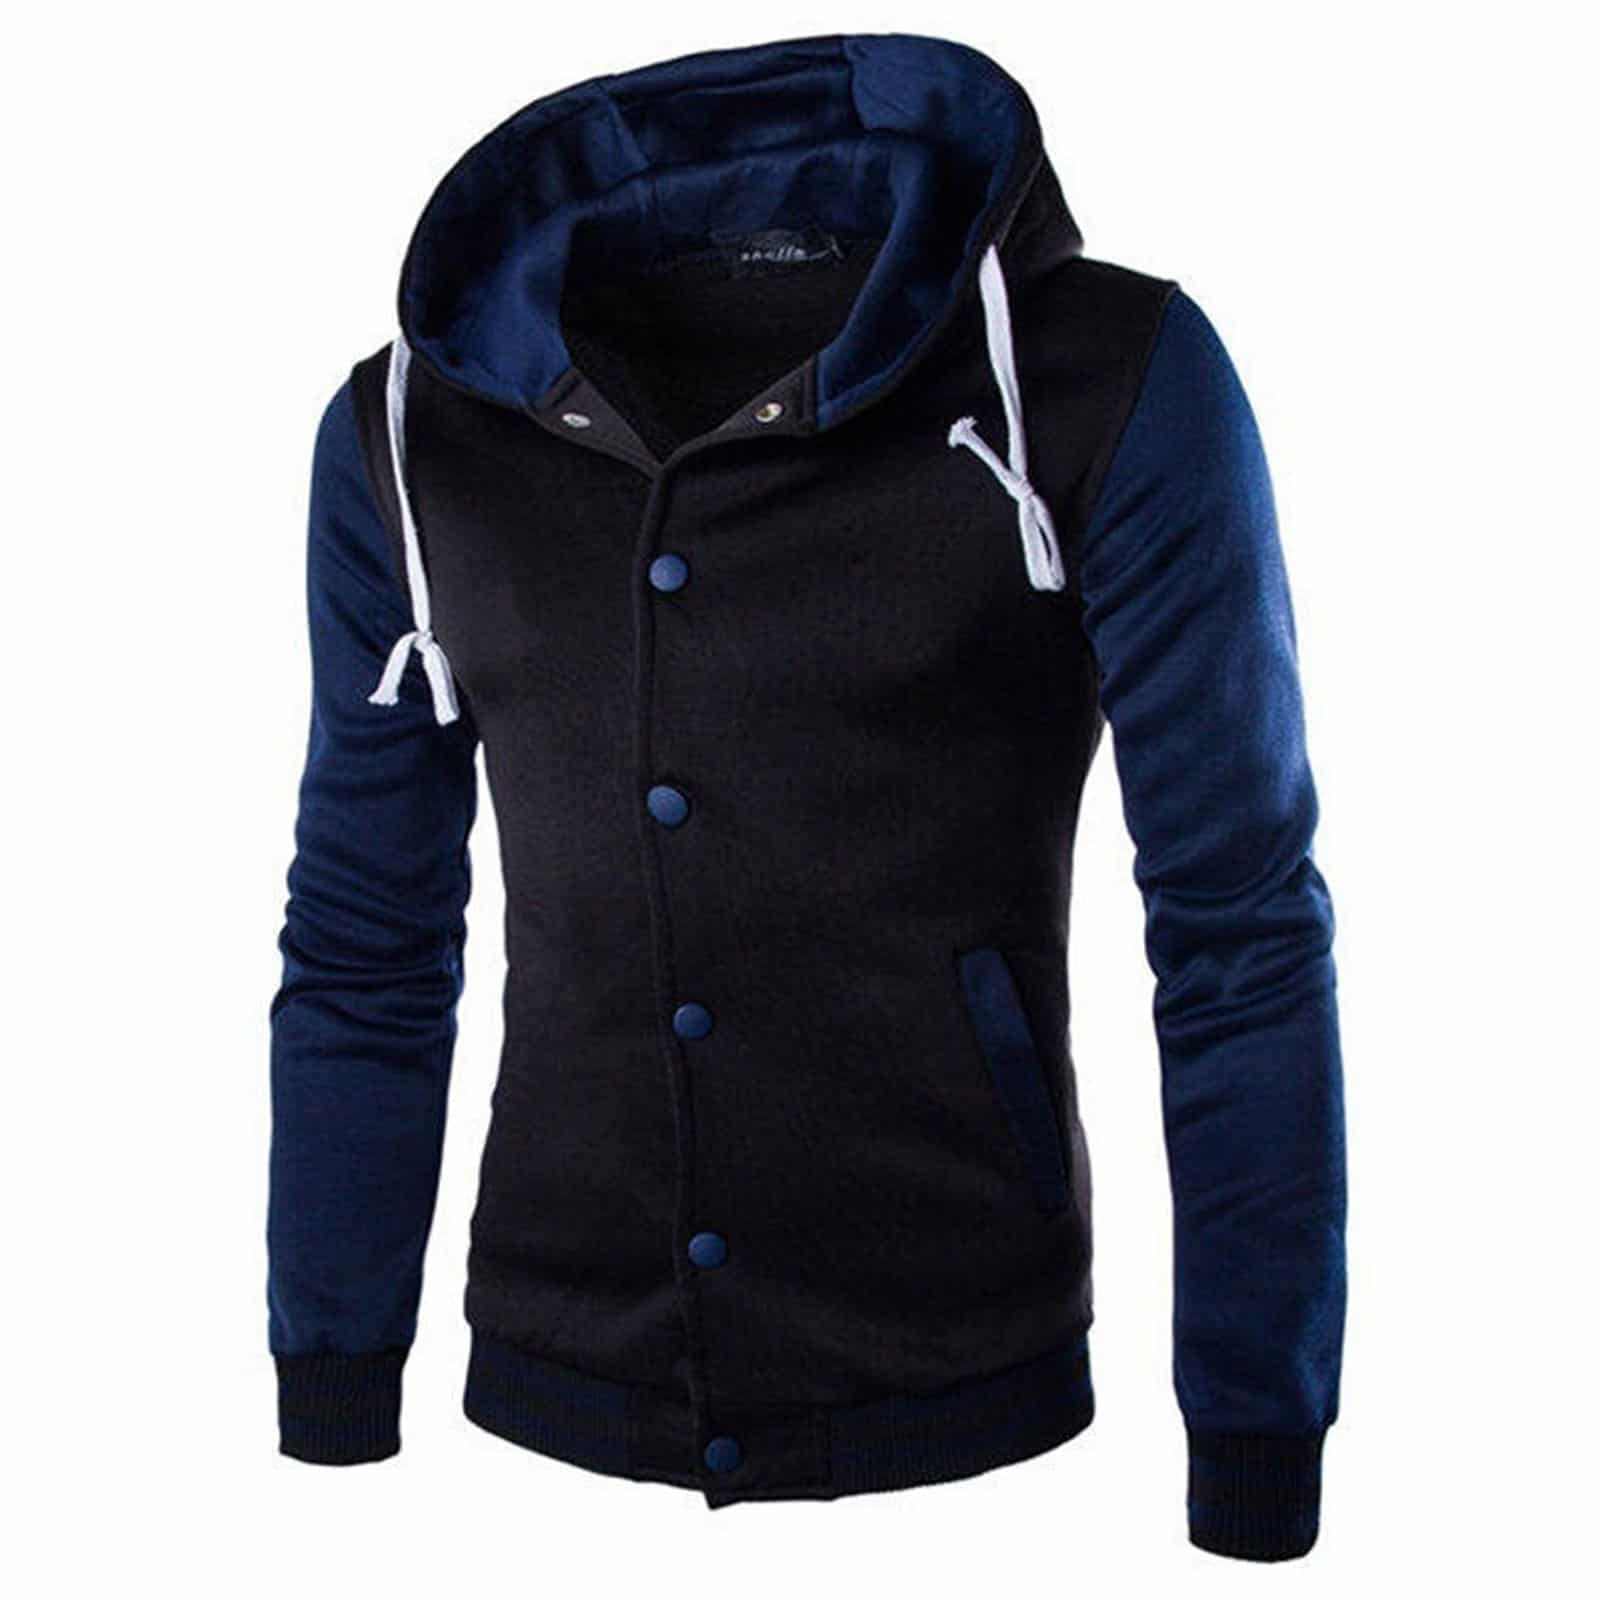 Completely new Hooded Letterman Varsity Style Jacket | Made to Order - Kilt and Jacks GK56